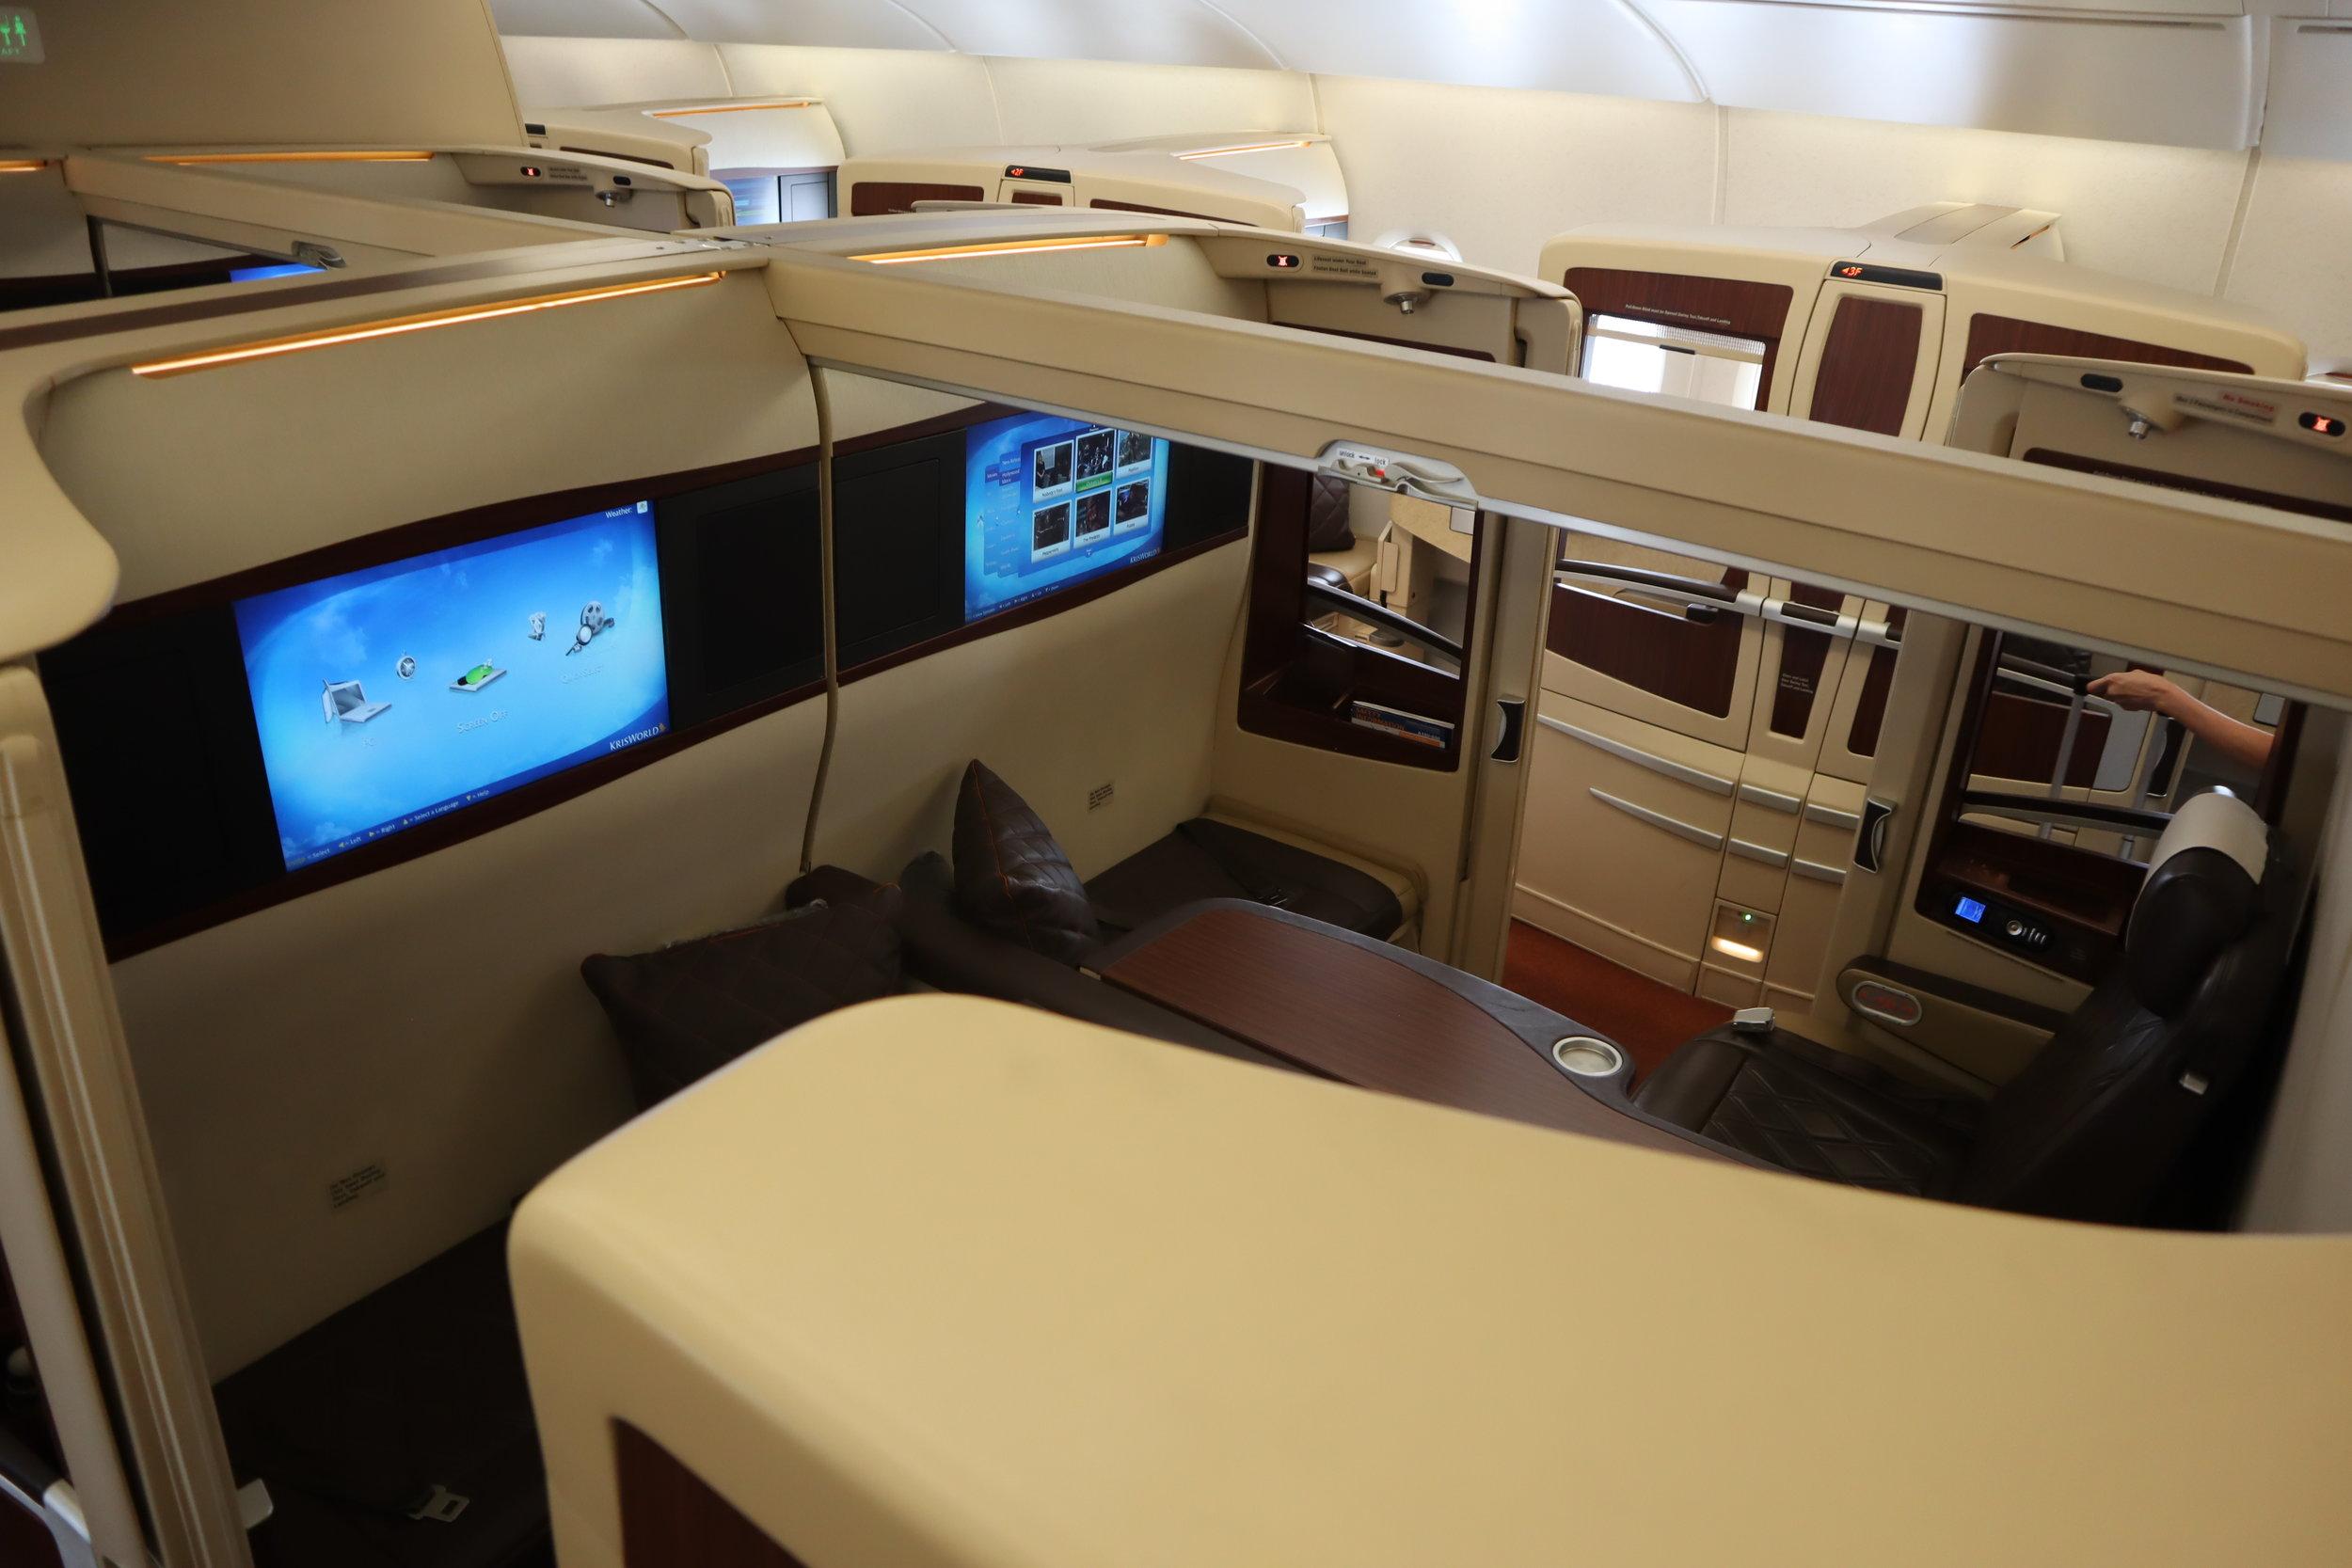 Singapore Airlines Suites Class – Cabin